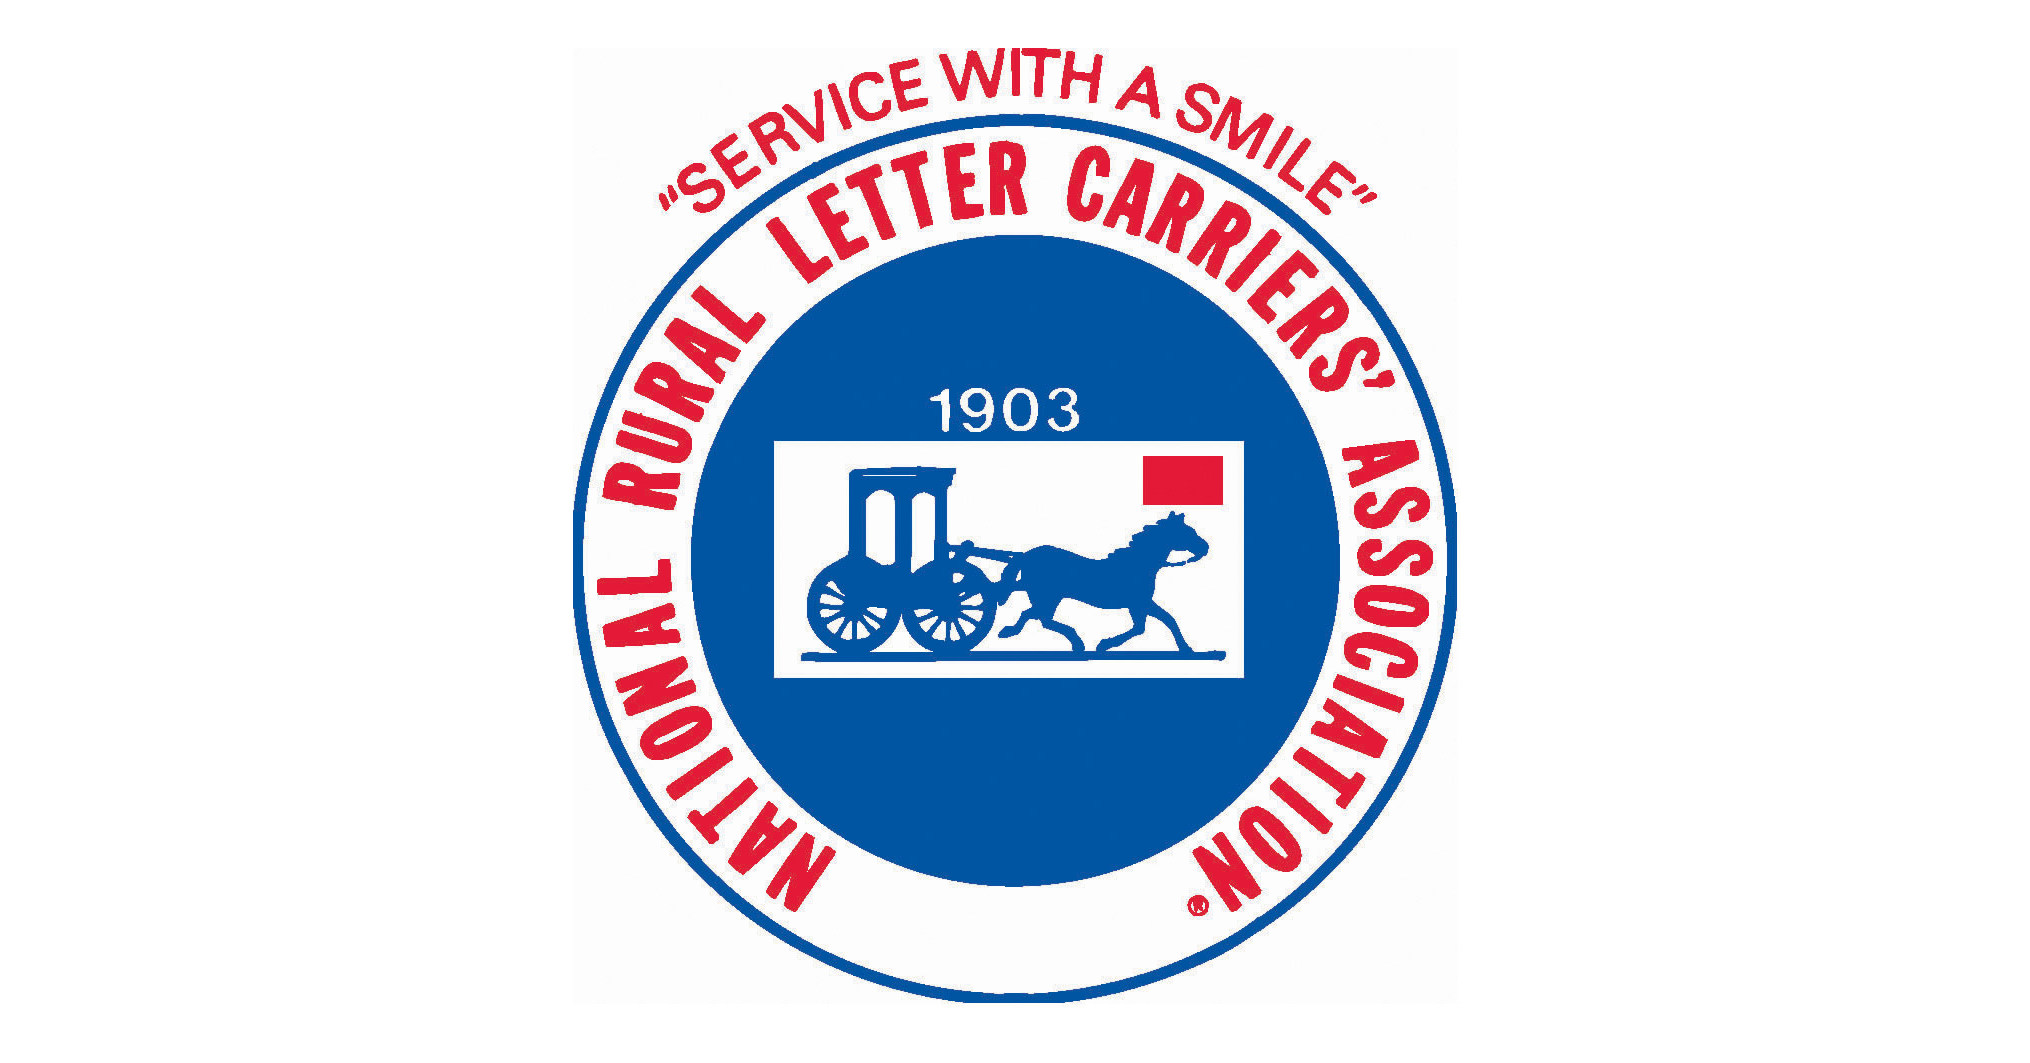 National Rural Letter Carriers' Association (NRLCA) Reaches